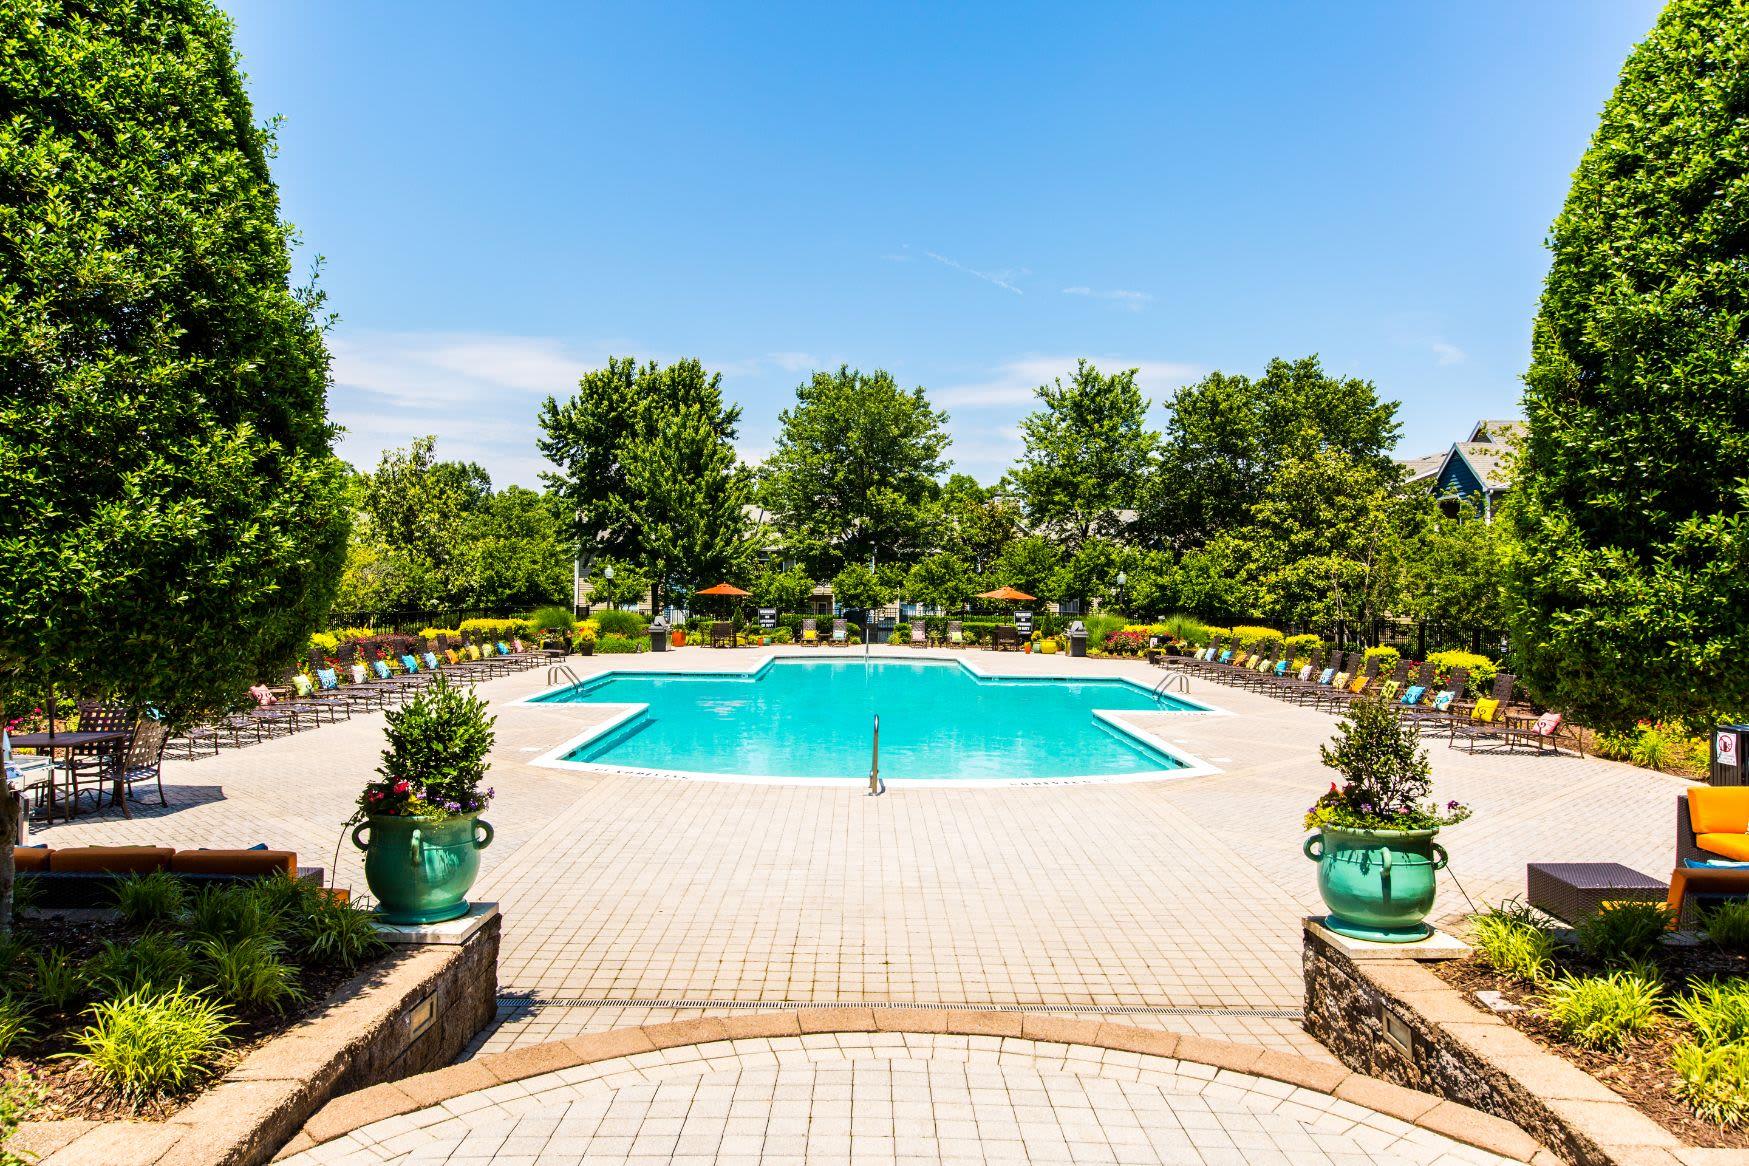 Beautiful swimming pool next to trees at Marquis at Silverton in Cary, North Carolina